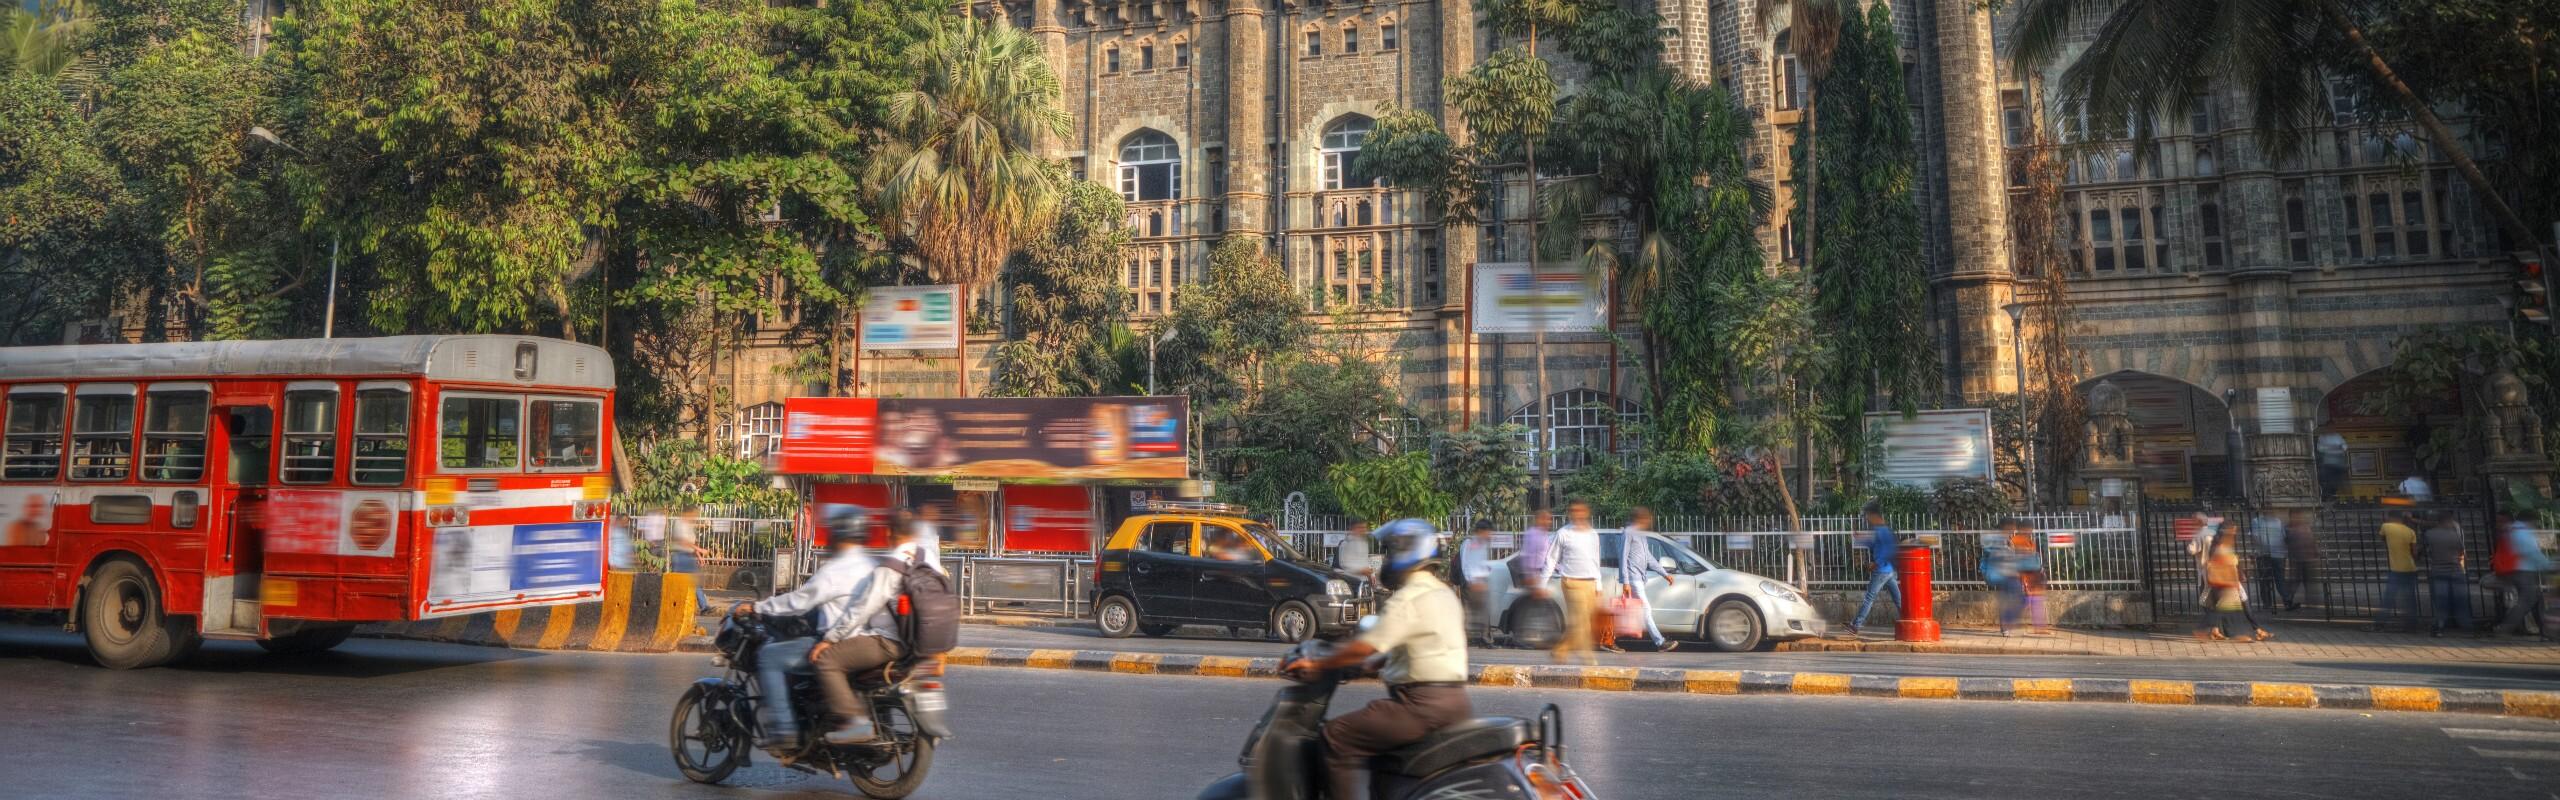 10 Best Hotels in Mumbai